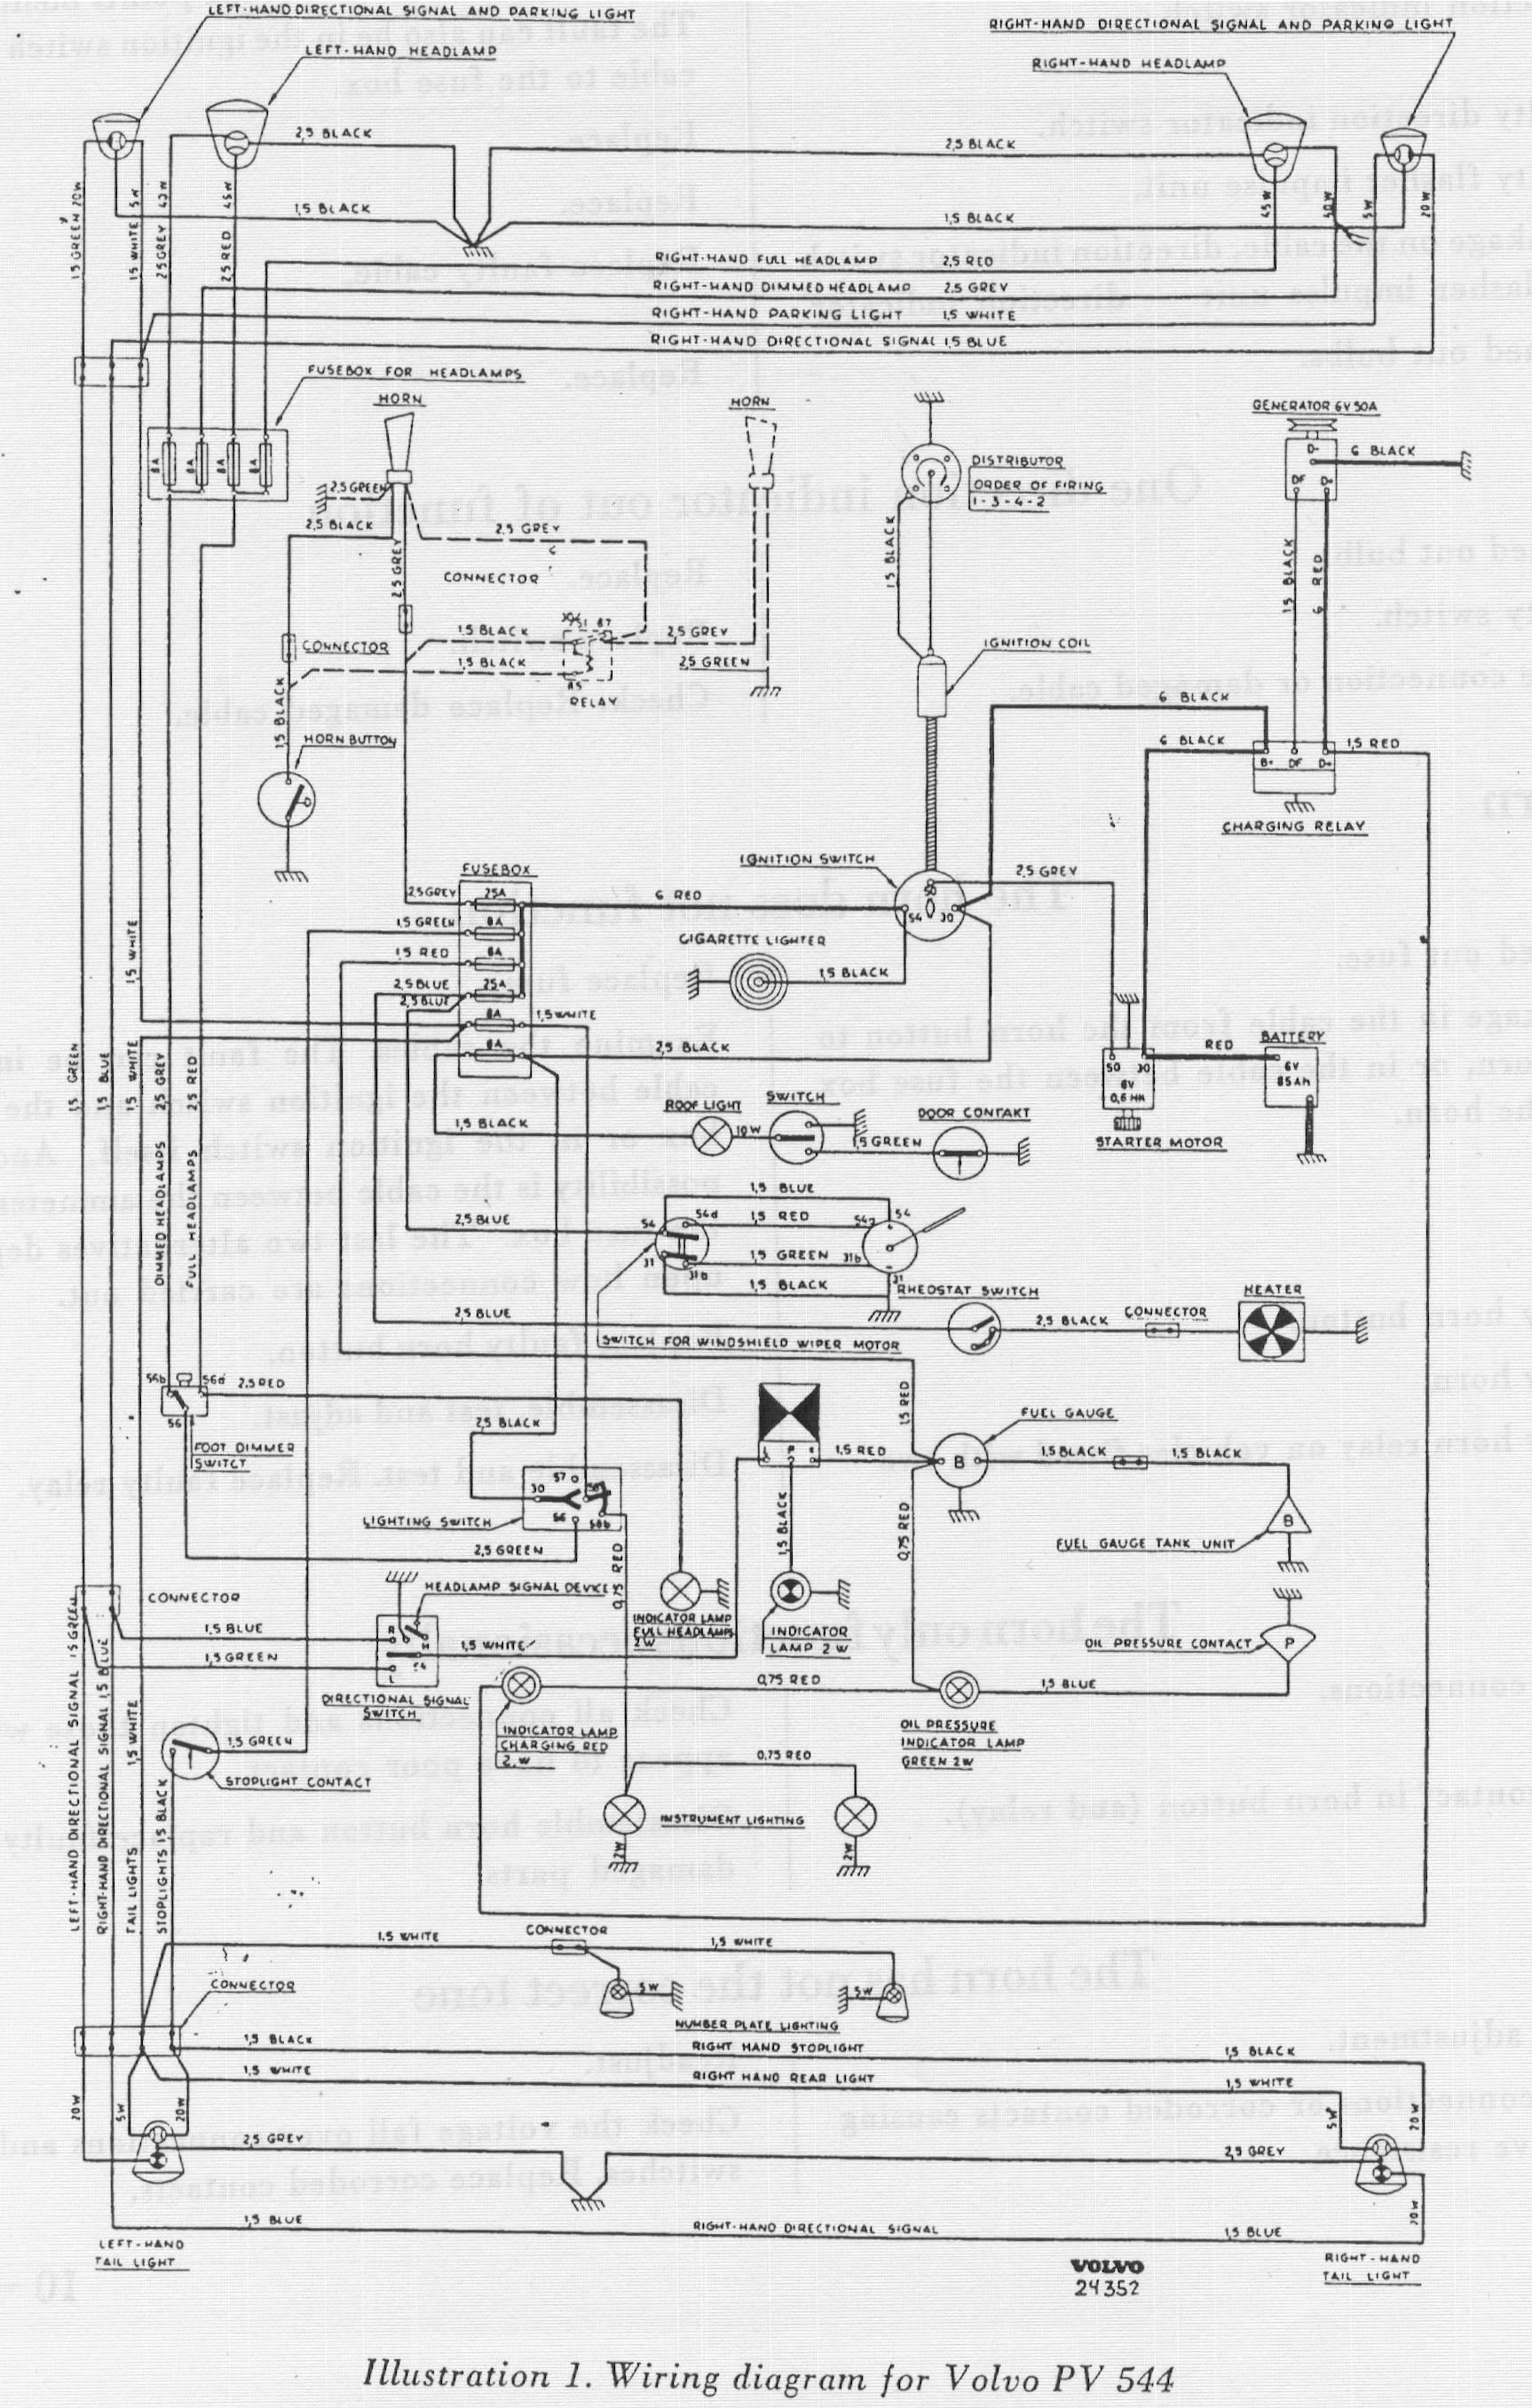 volvo wiring diagrams 850 bmw e46 touring tailgate diagram 1996 pdf projectfilecloud